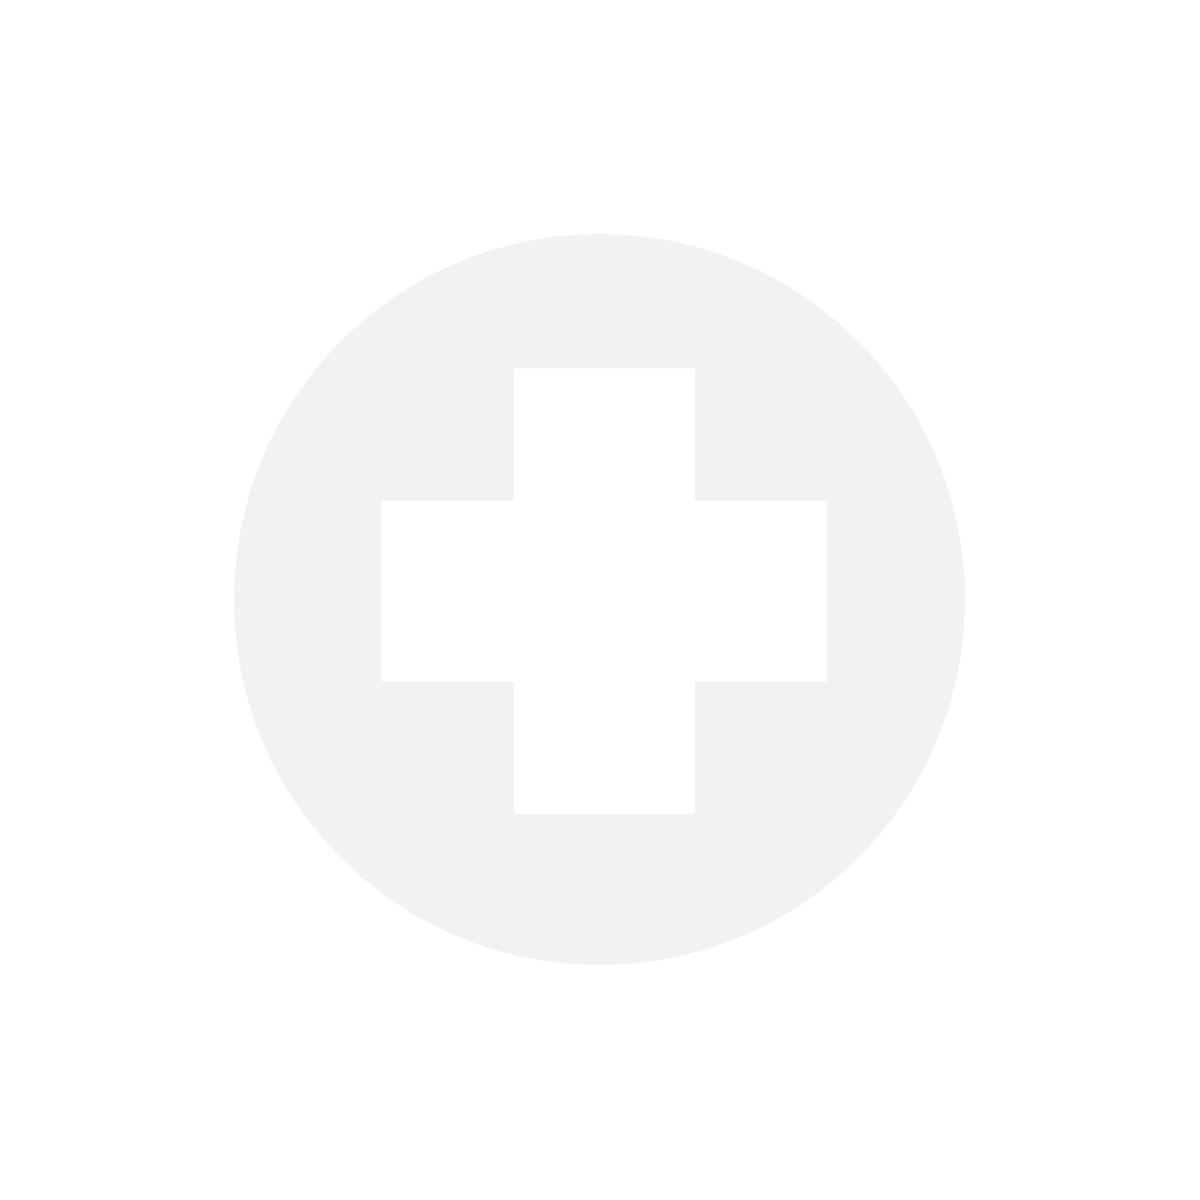 Stéthoscope Idéal + Adulte, Pavillon double